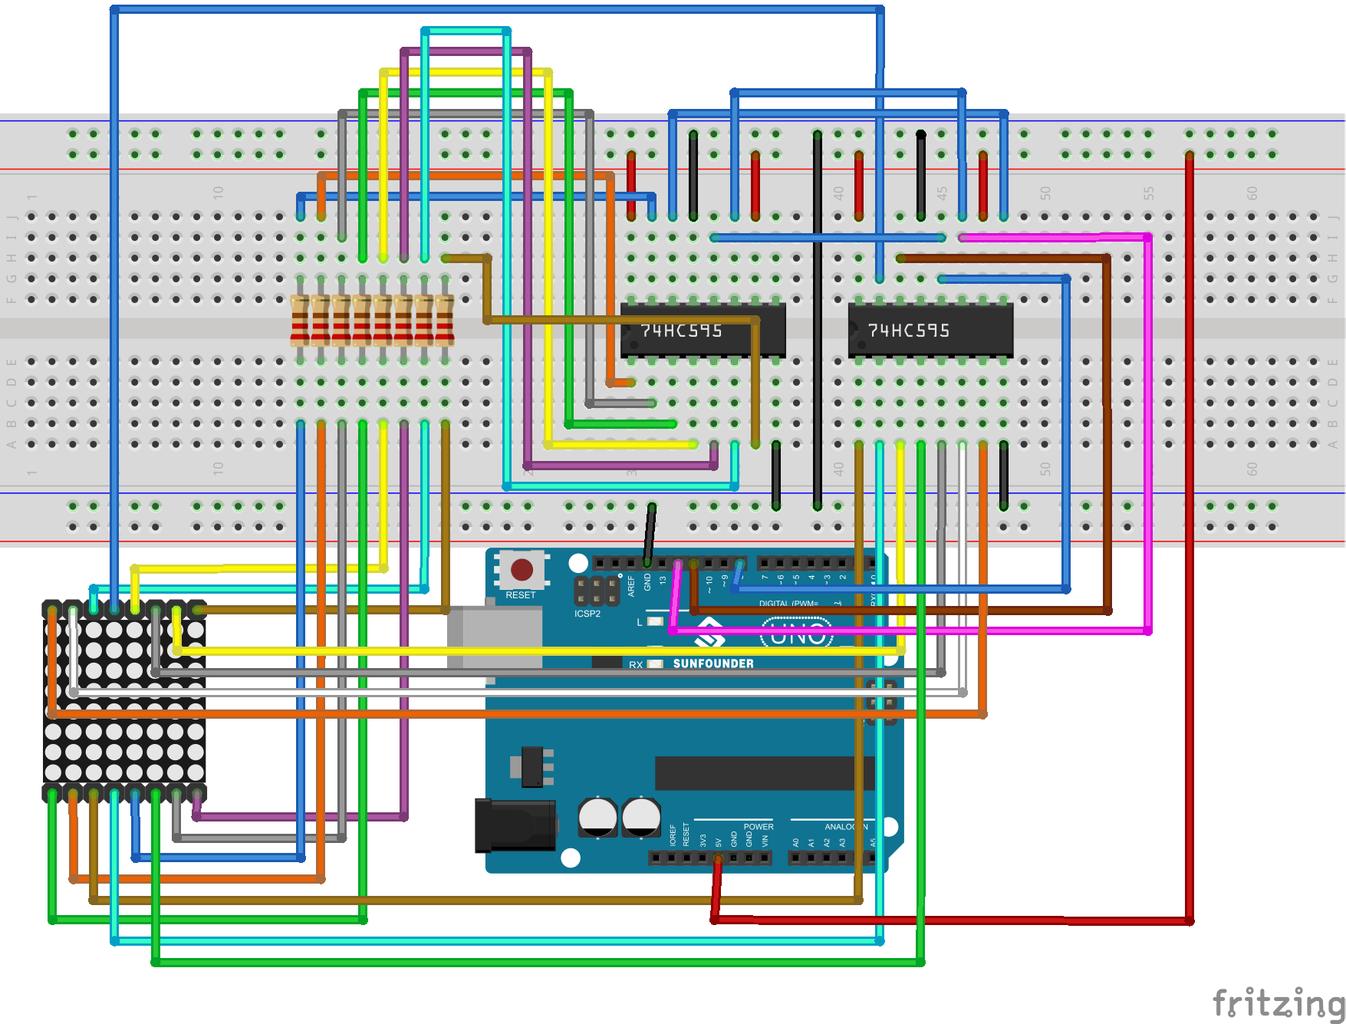 Step 3: 8x8 Dot Matrix